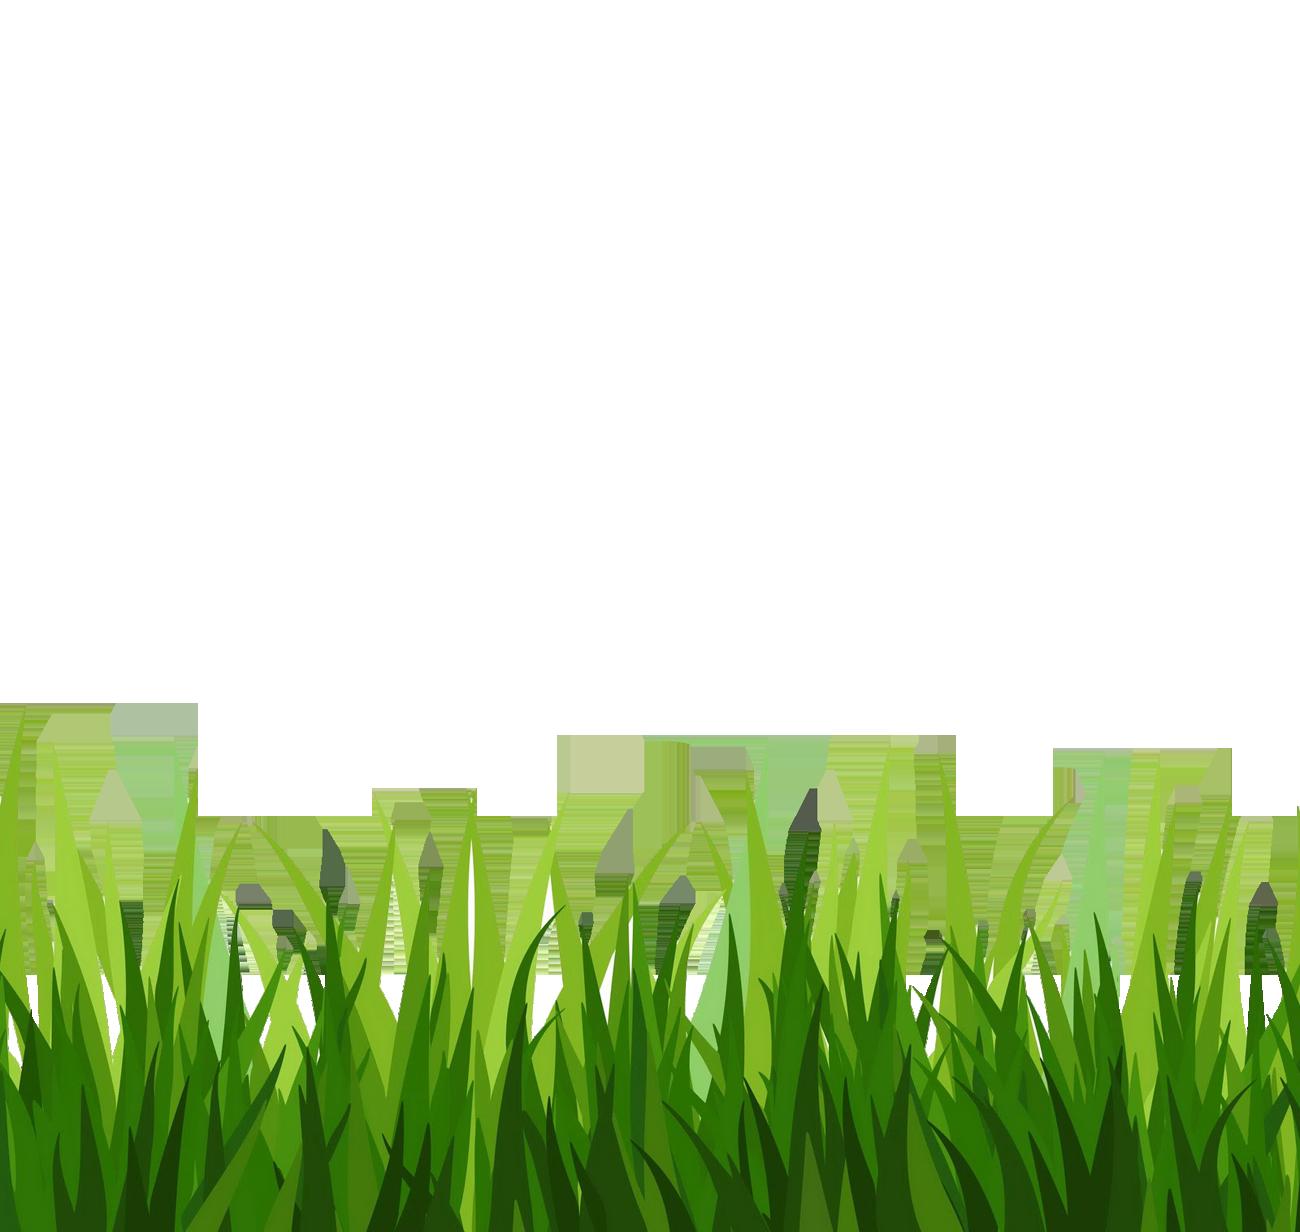 Grass clipart image green